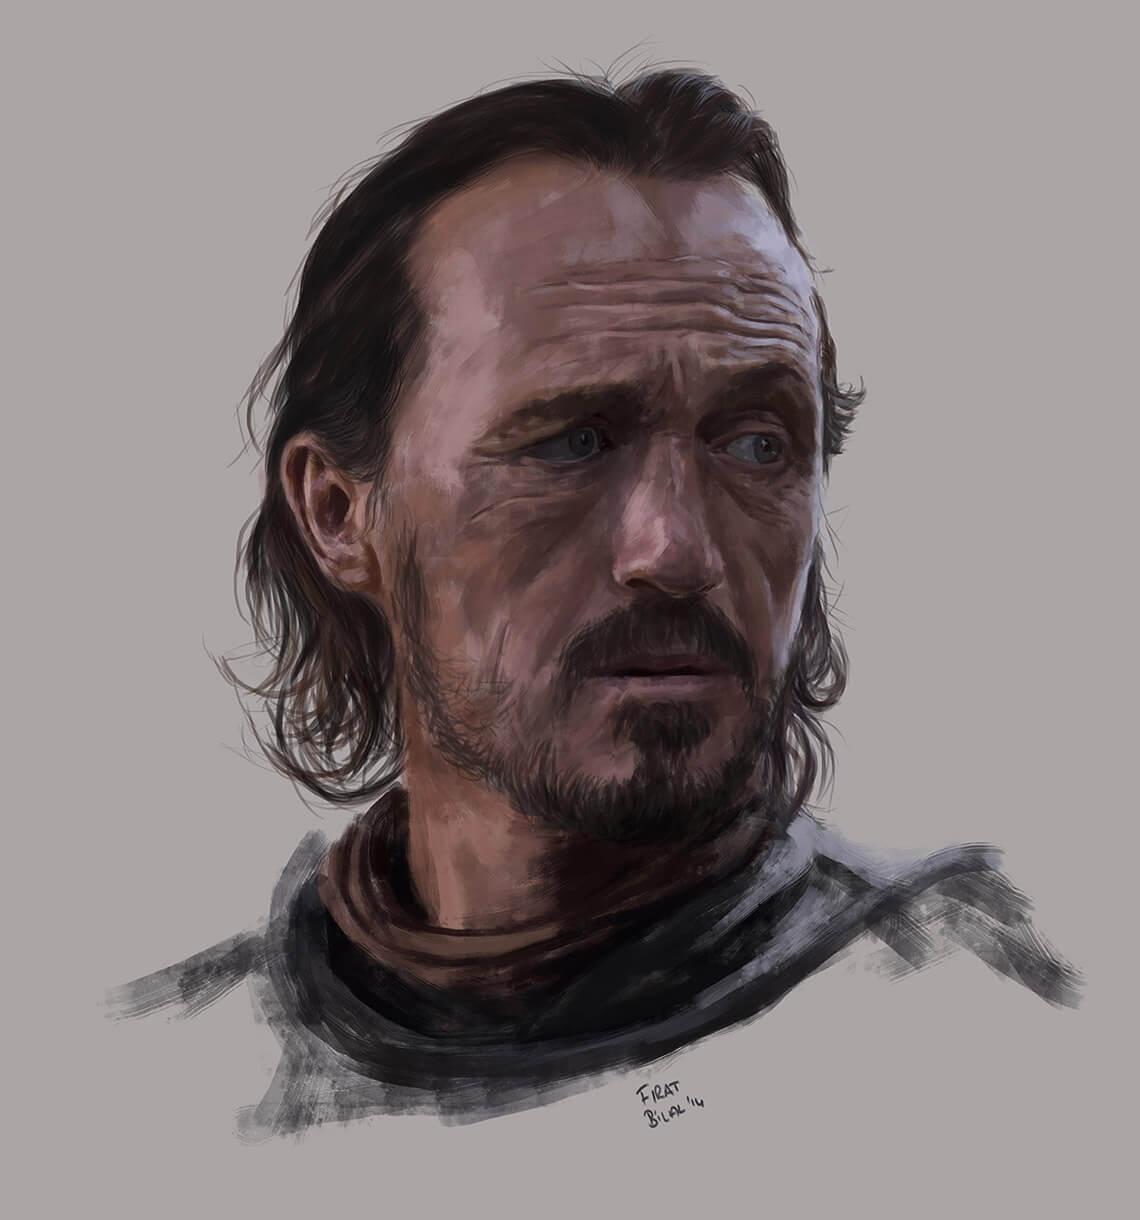 Bronn by Firat Bilal